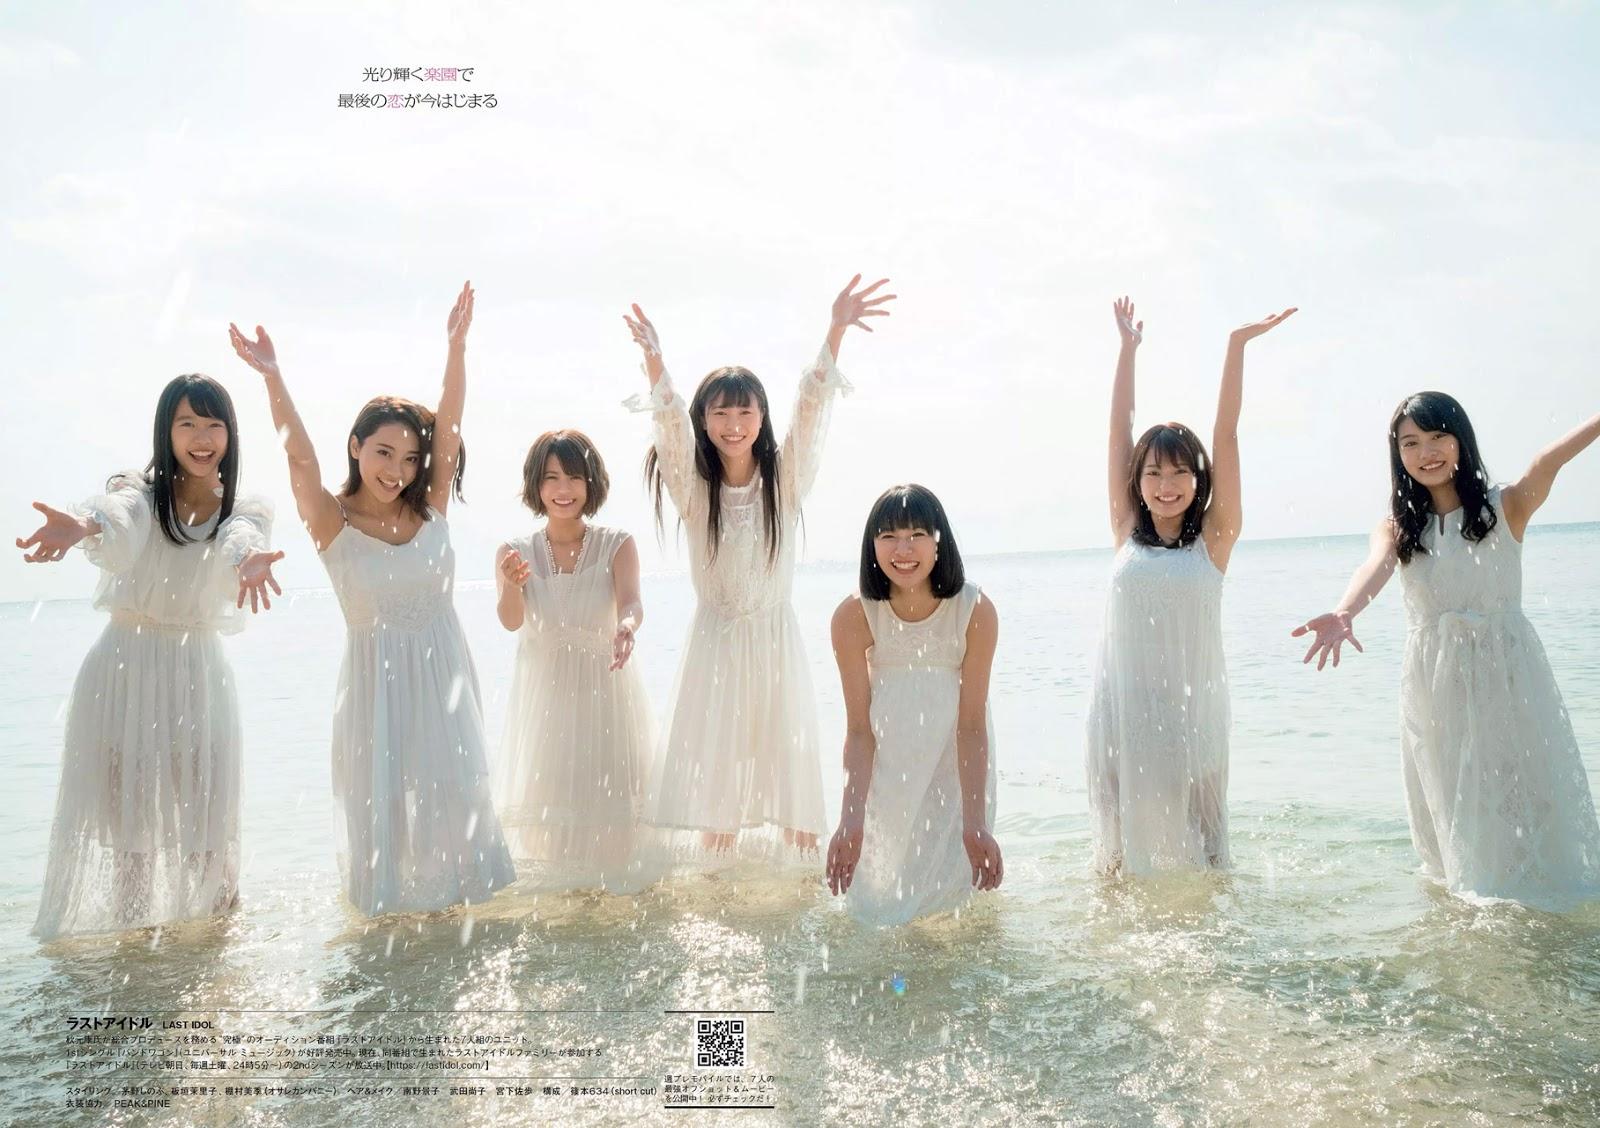 Last Idol ラストアイドル, Weekly Playboy 2018 No.05 Part.02 (週刊プレイボーイ 2018年05号)